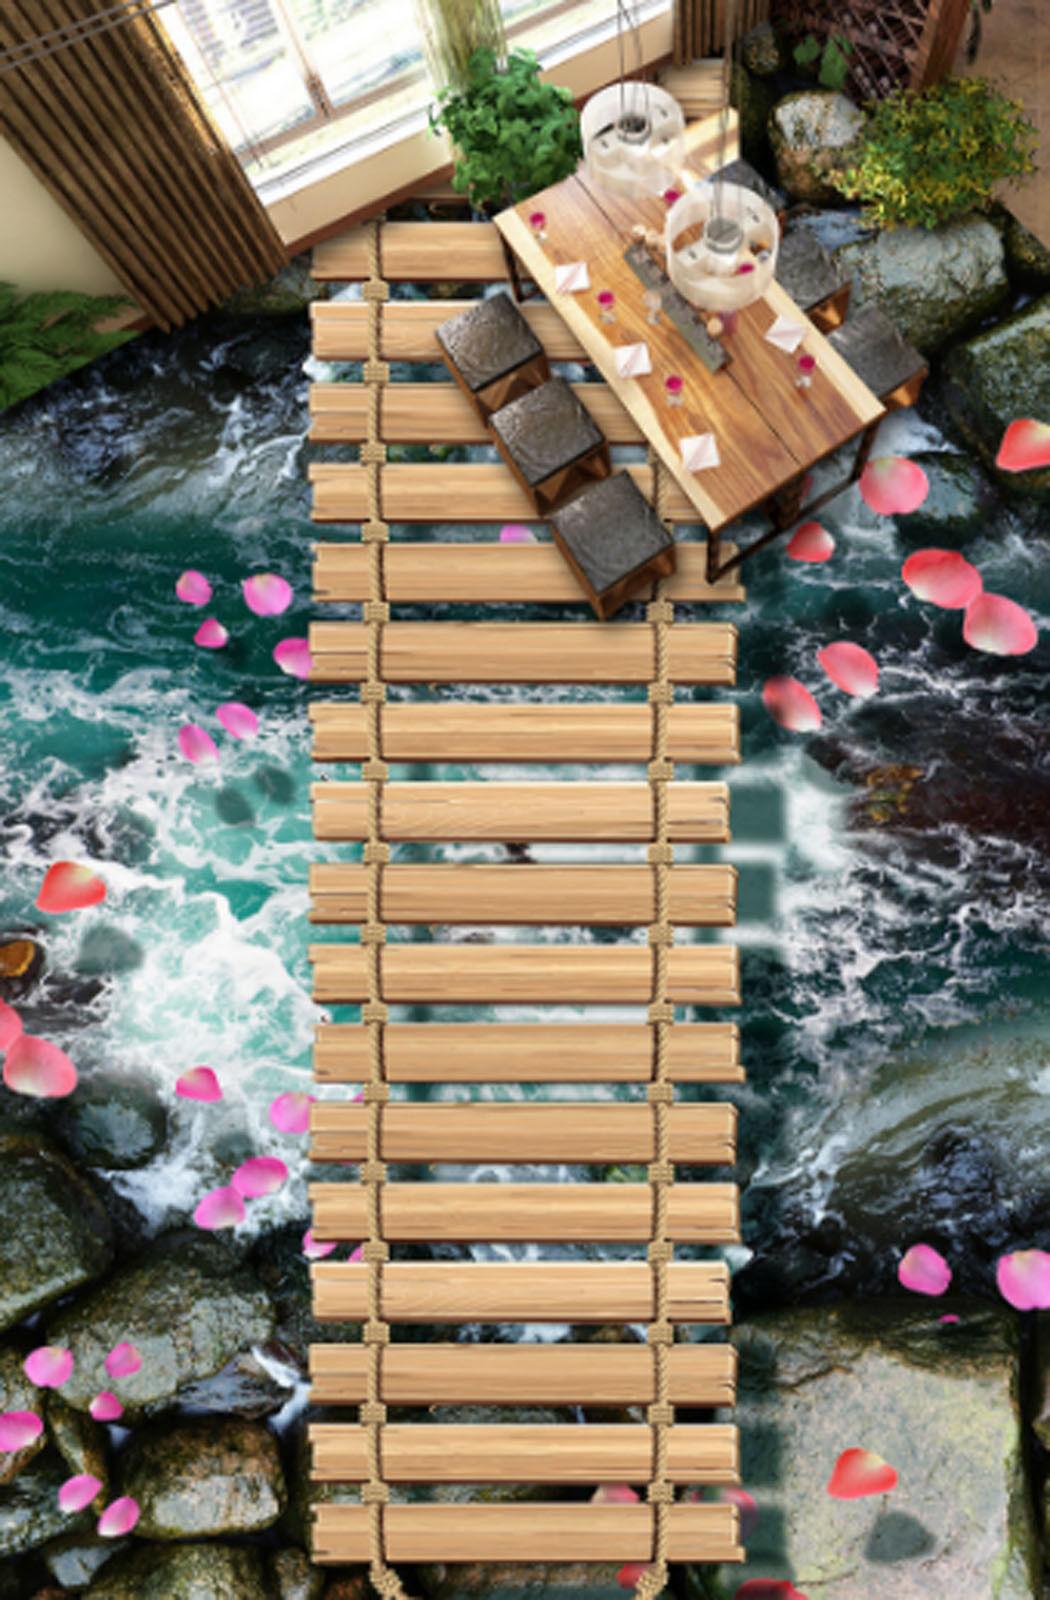 3D Stream Petals 437 Floor WallPaper Murals Wallpaper Mural Print AJ AU Lemon